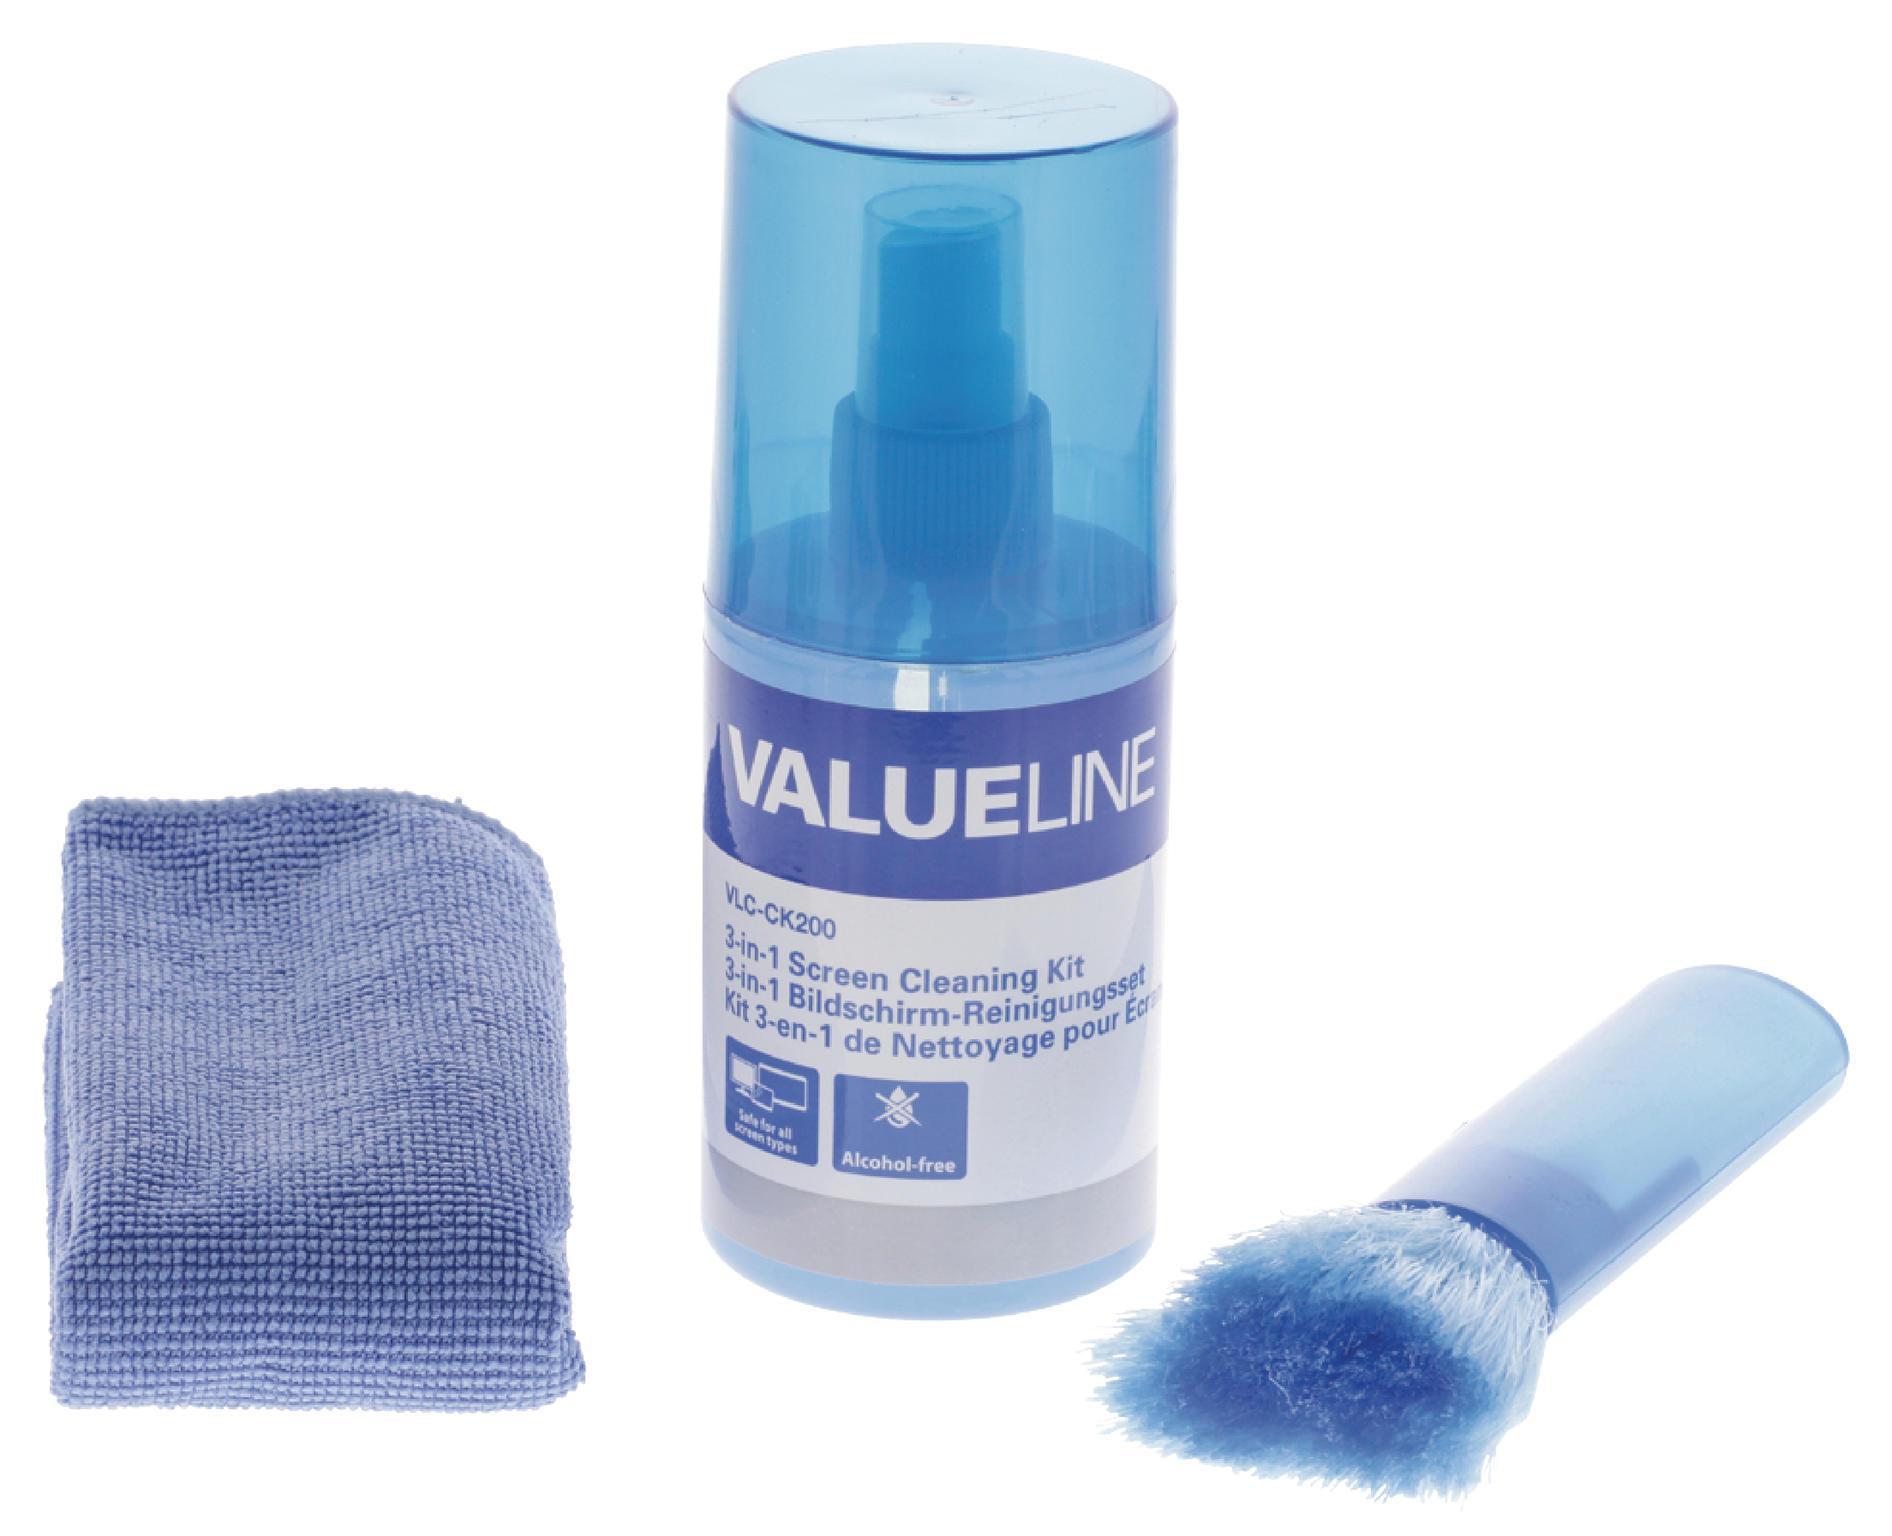 Valueline Schermreiniger set 200 ml